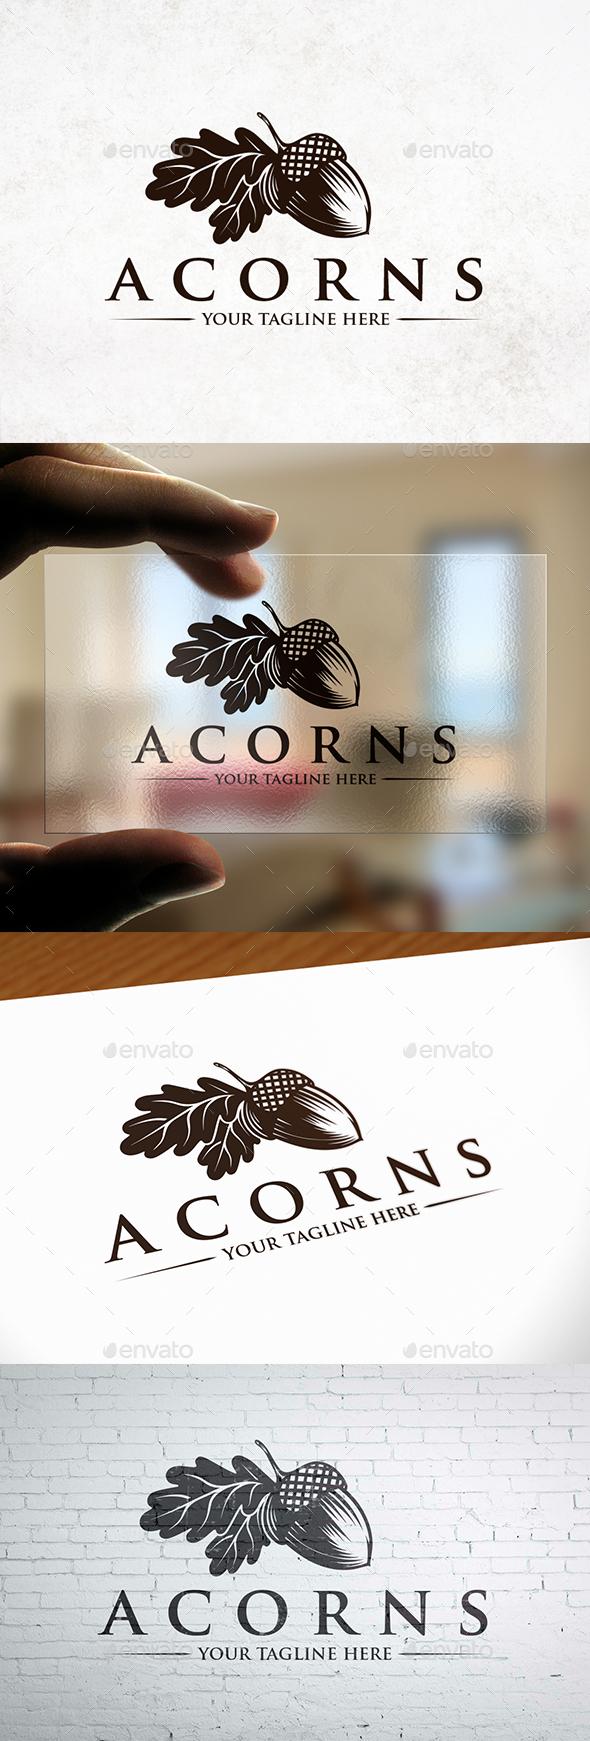 Creative Acorn Logo Template - Nature Logo Templates